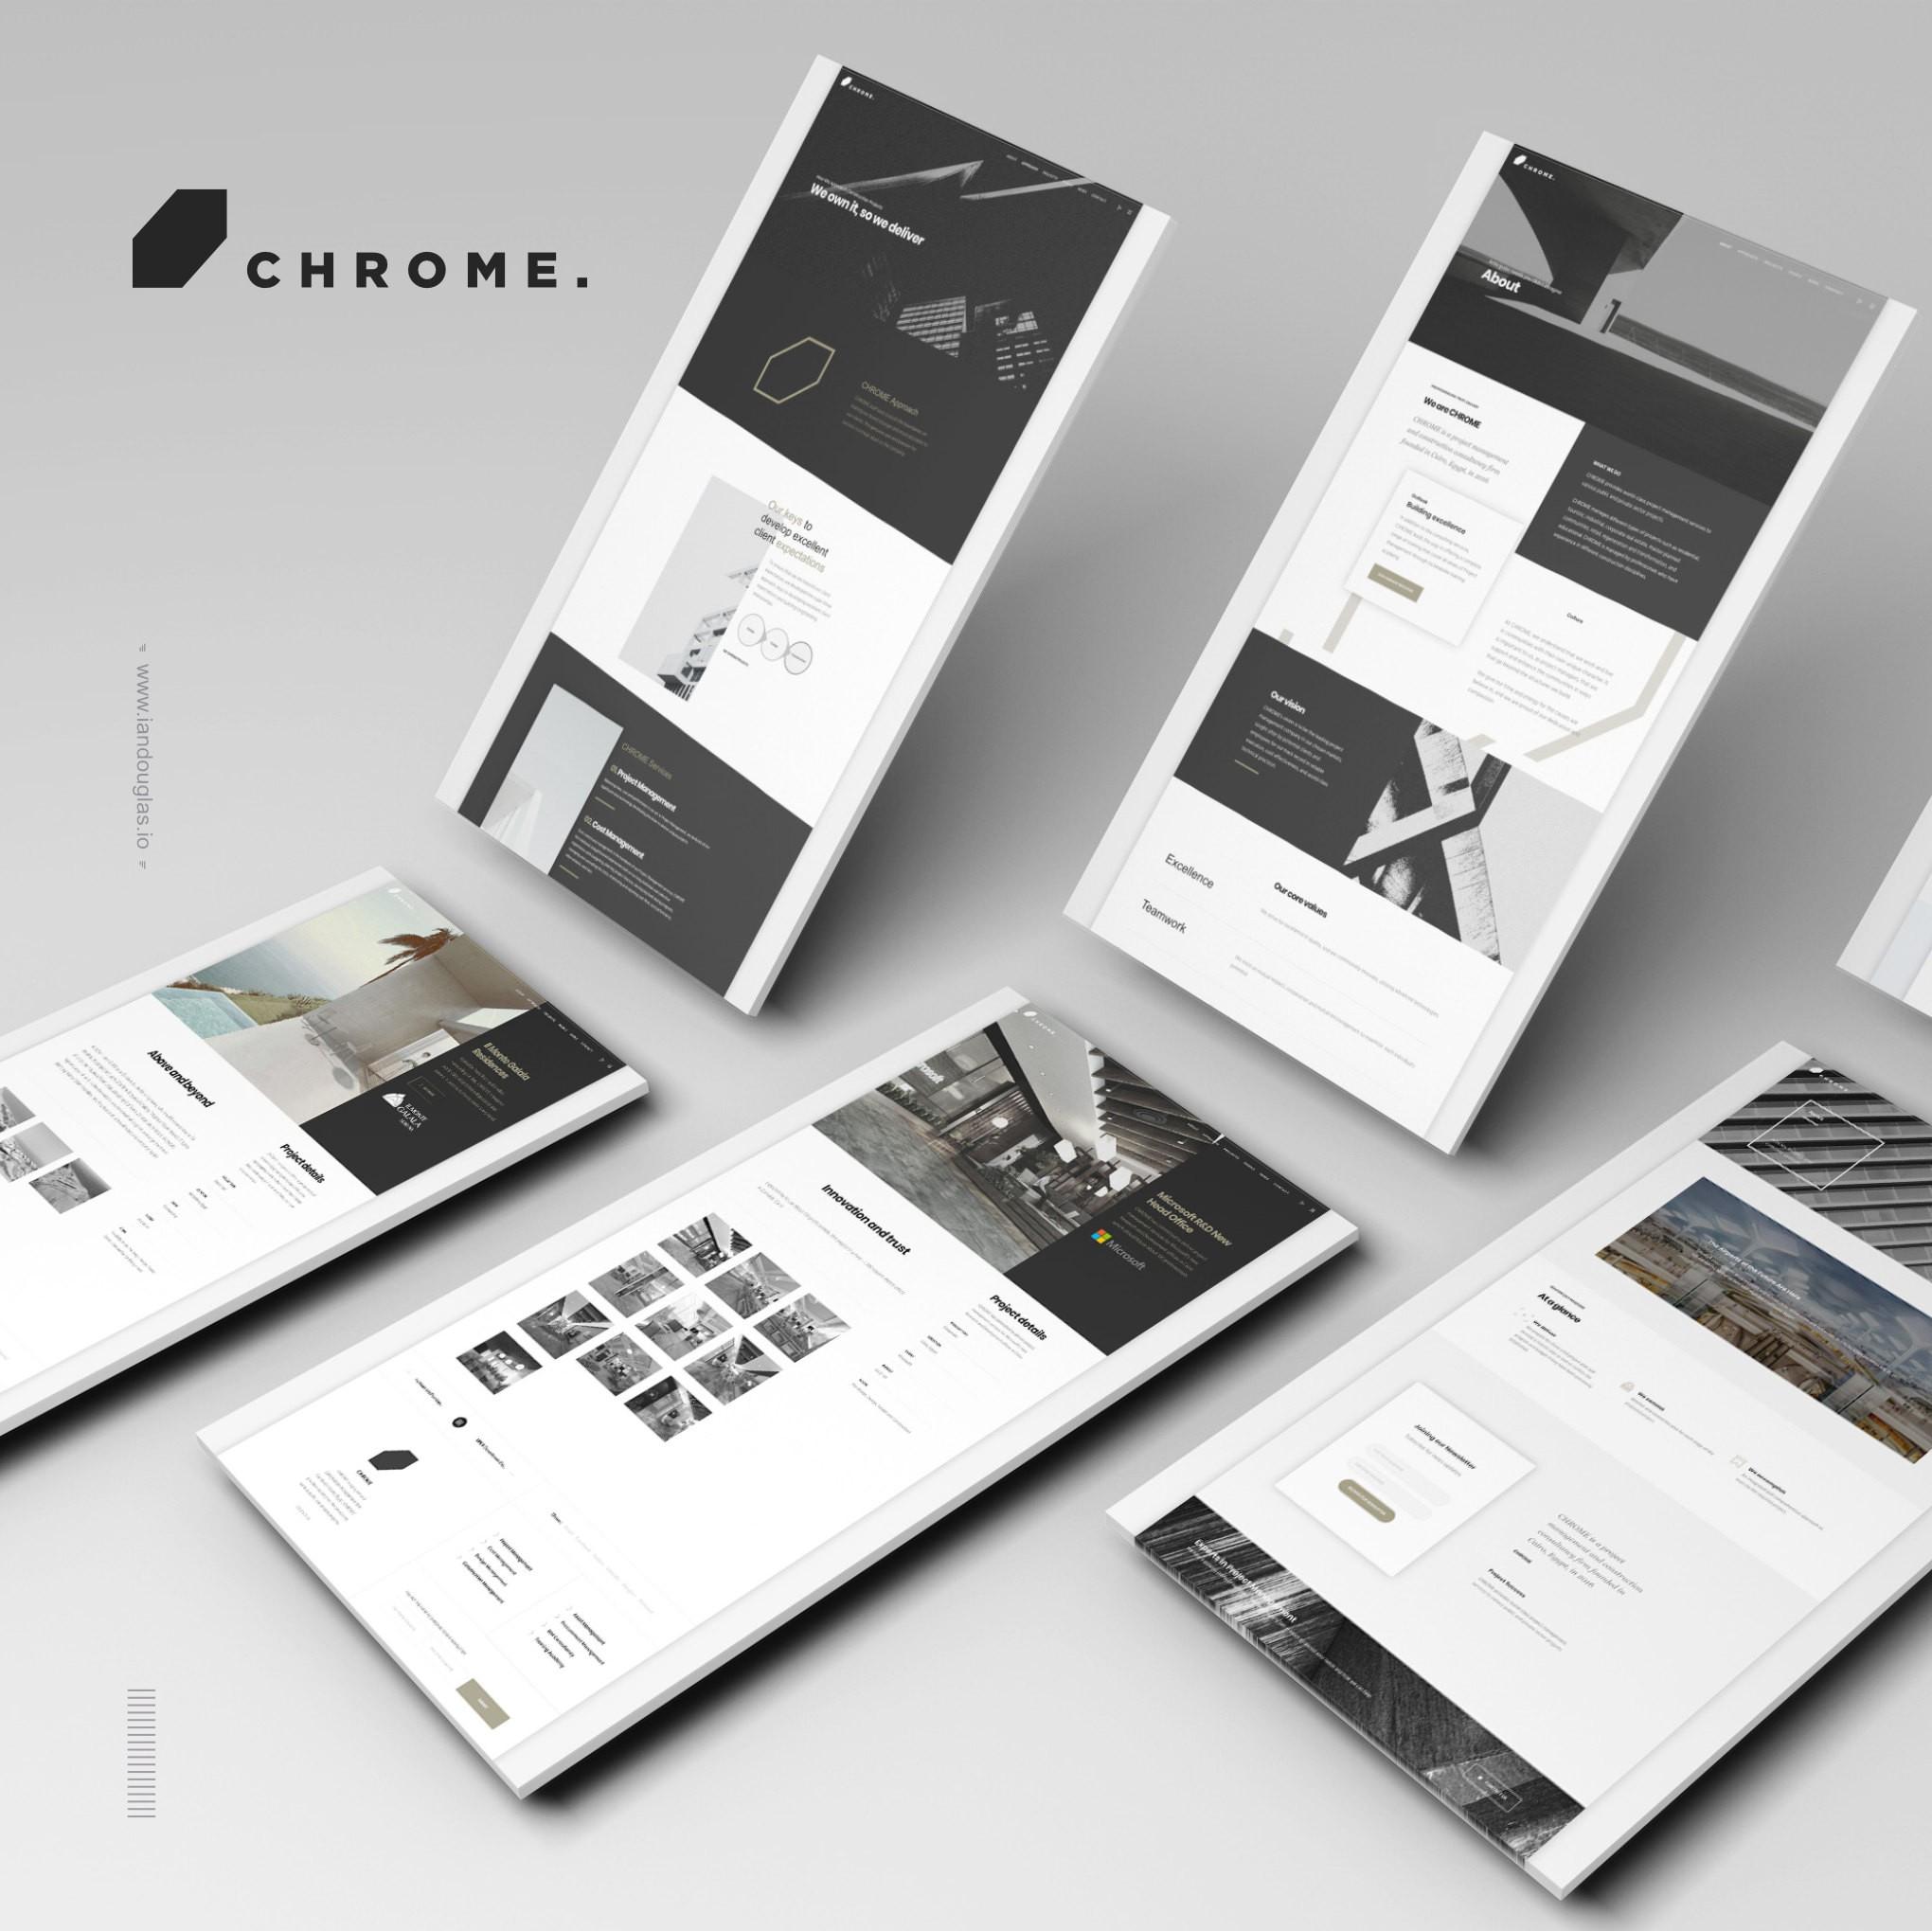 Web design and development, art direction for Chrome